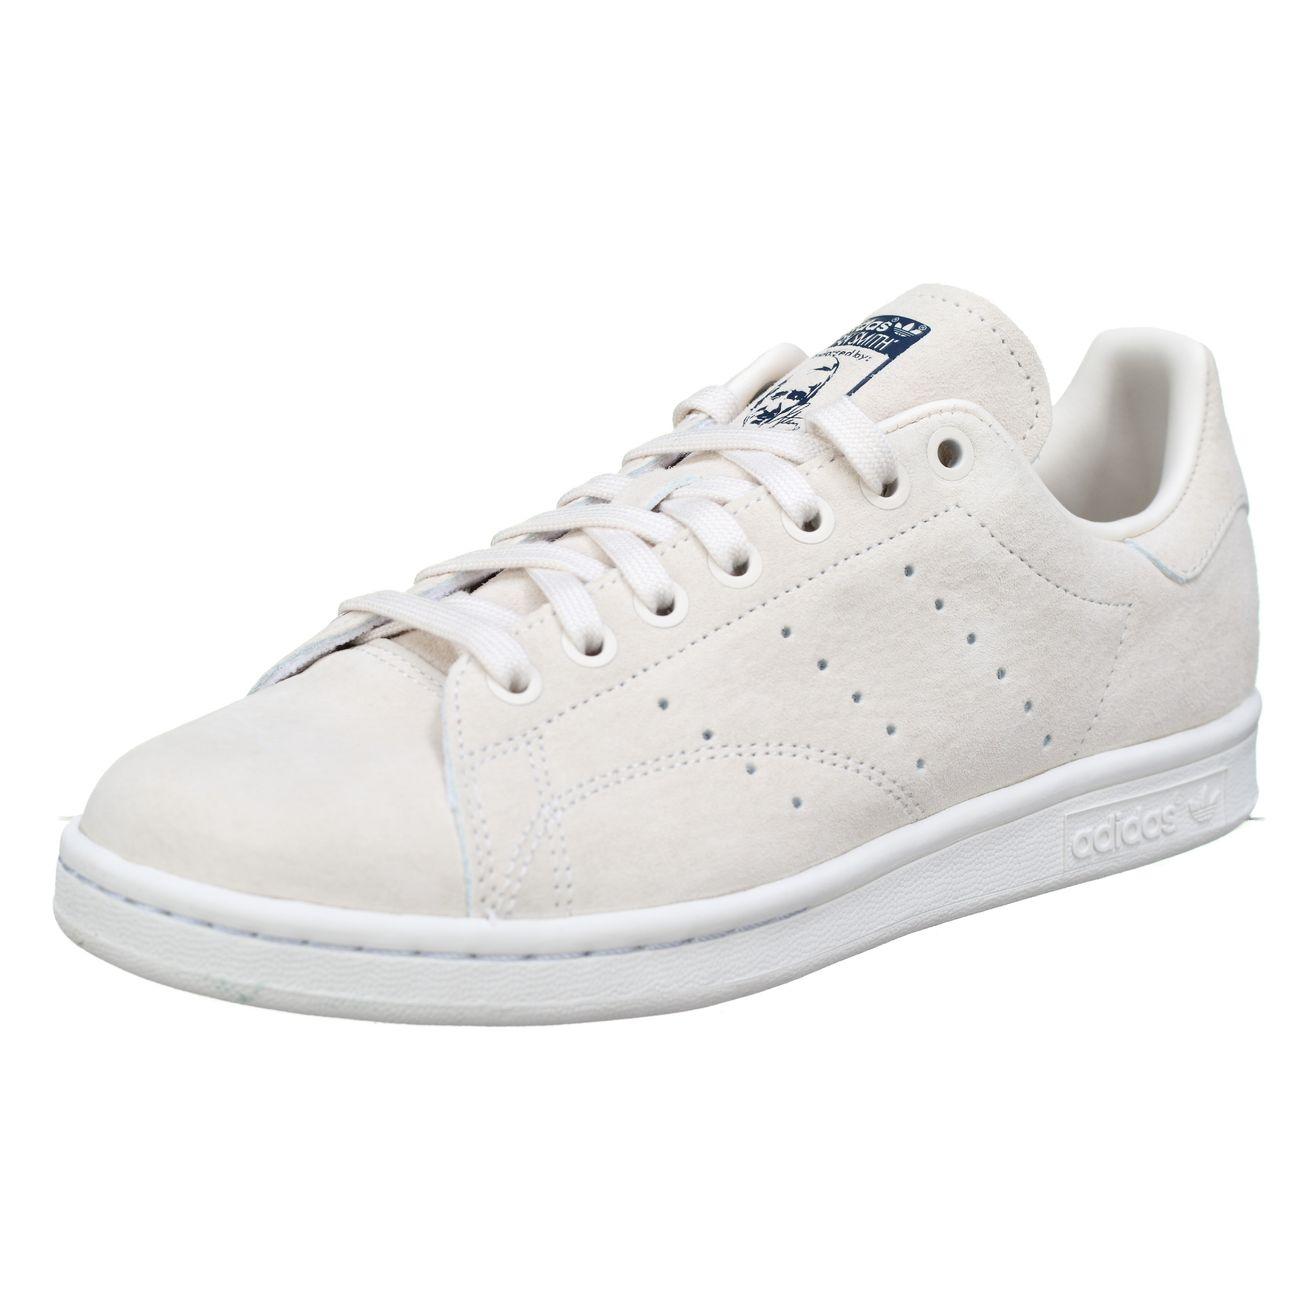 super cute cheap prices nice cheap homme ADIDAS Basket Adidas Stan Smith Cm8440 Beige